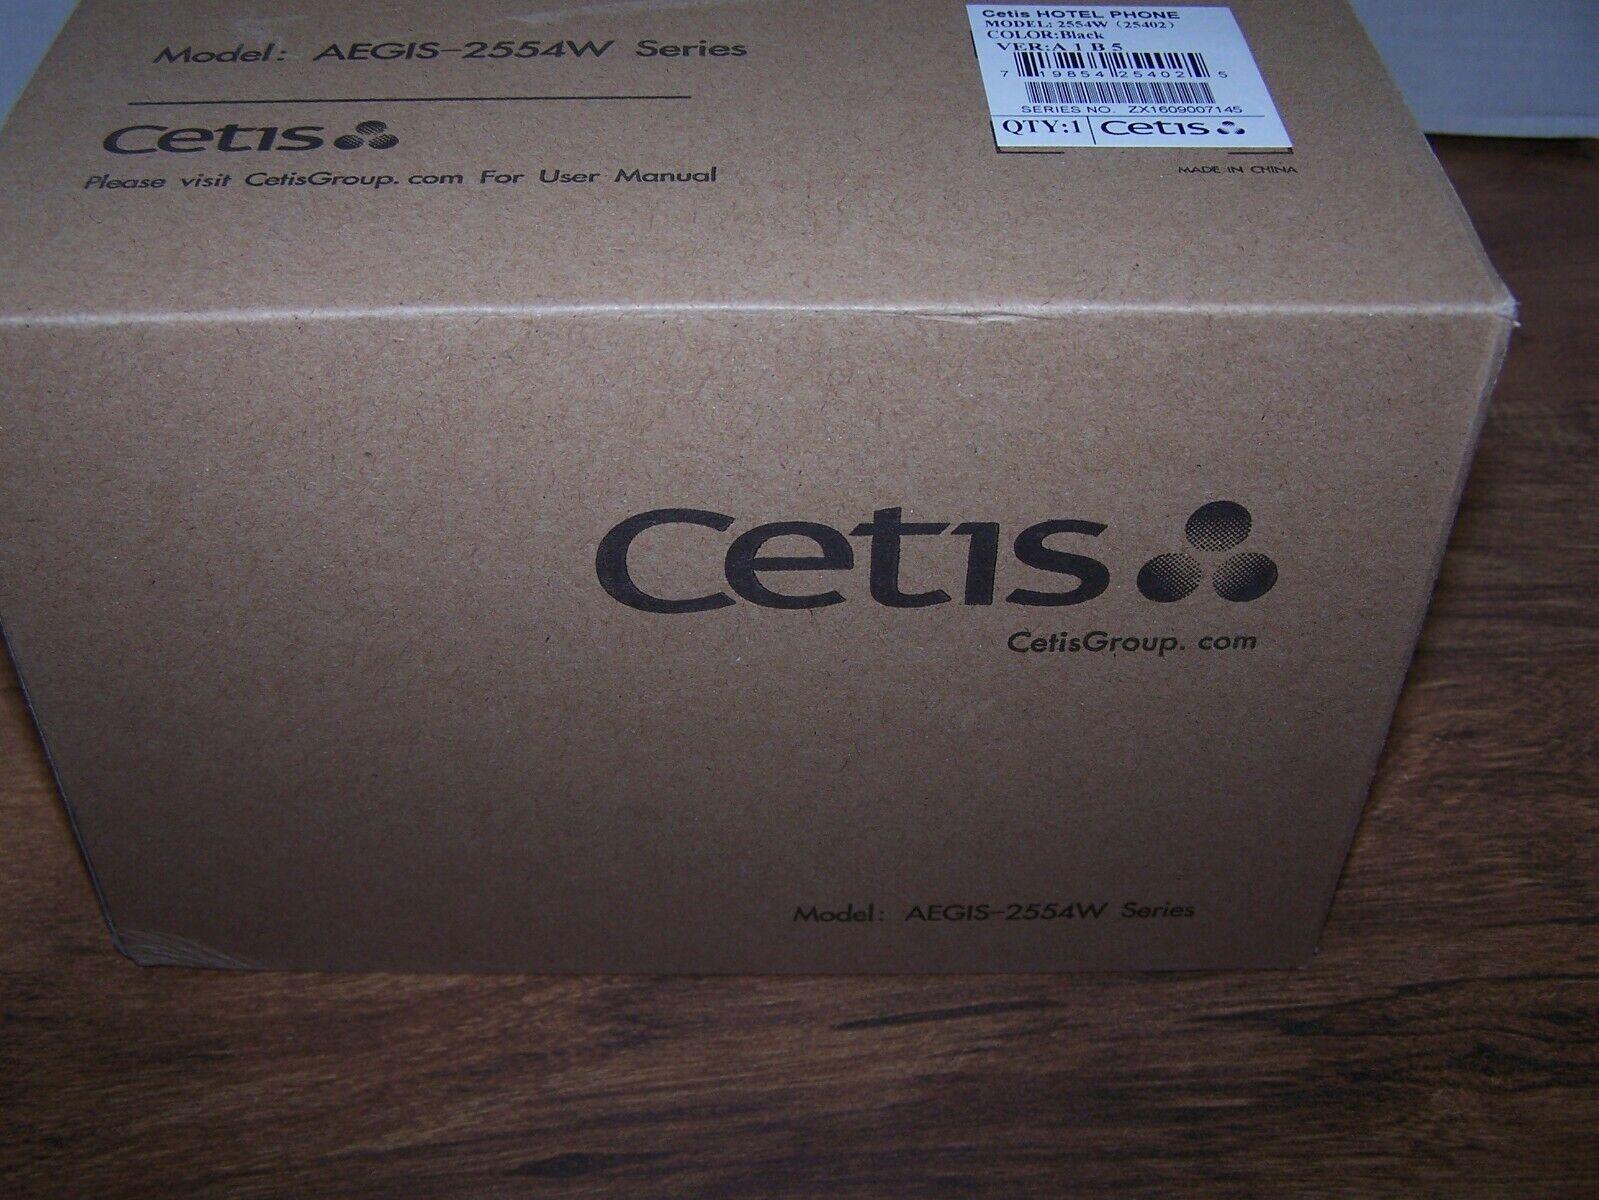 NEW Cetis Black Single Line Corded Hotel Wall Phone 2554W AEGIS-2554W 25402